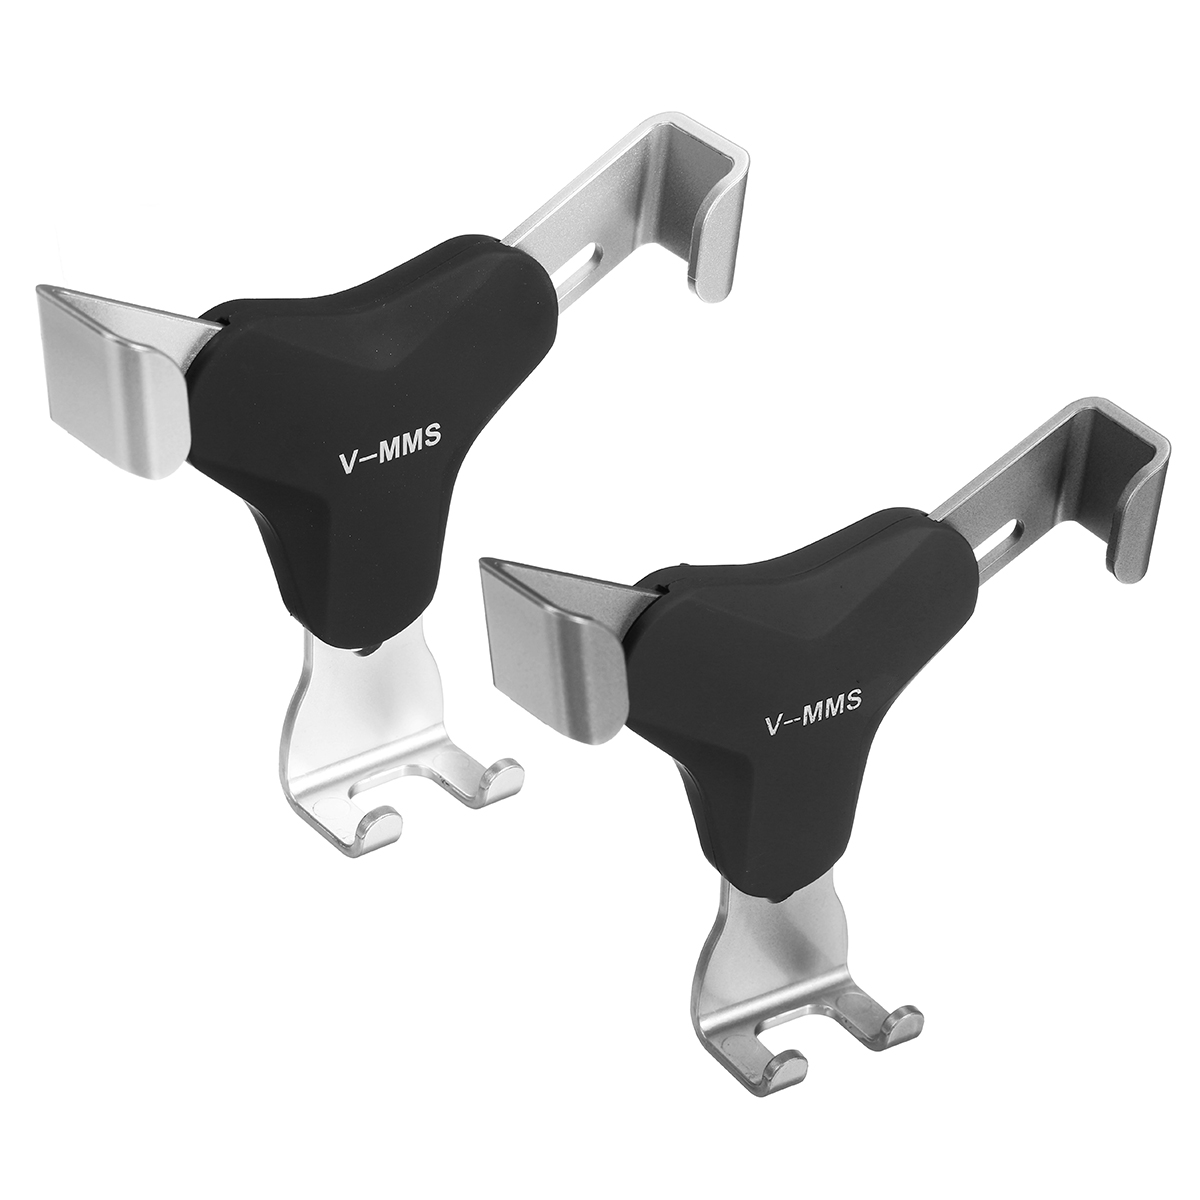 Universal Adjustable Car Air Vent Gravity Holder Mobile Phone Car Mount Bracket for iPhone Samsung